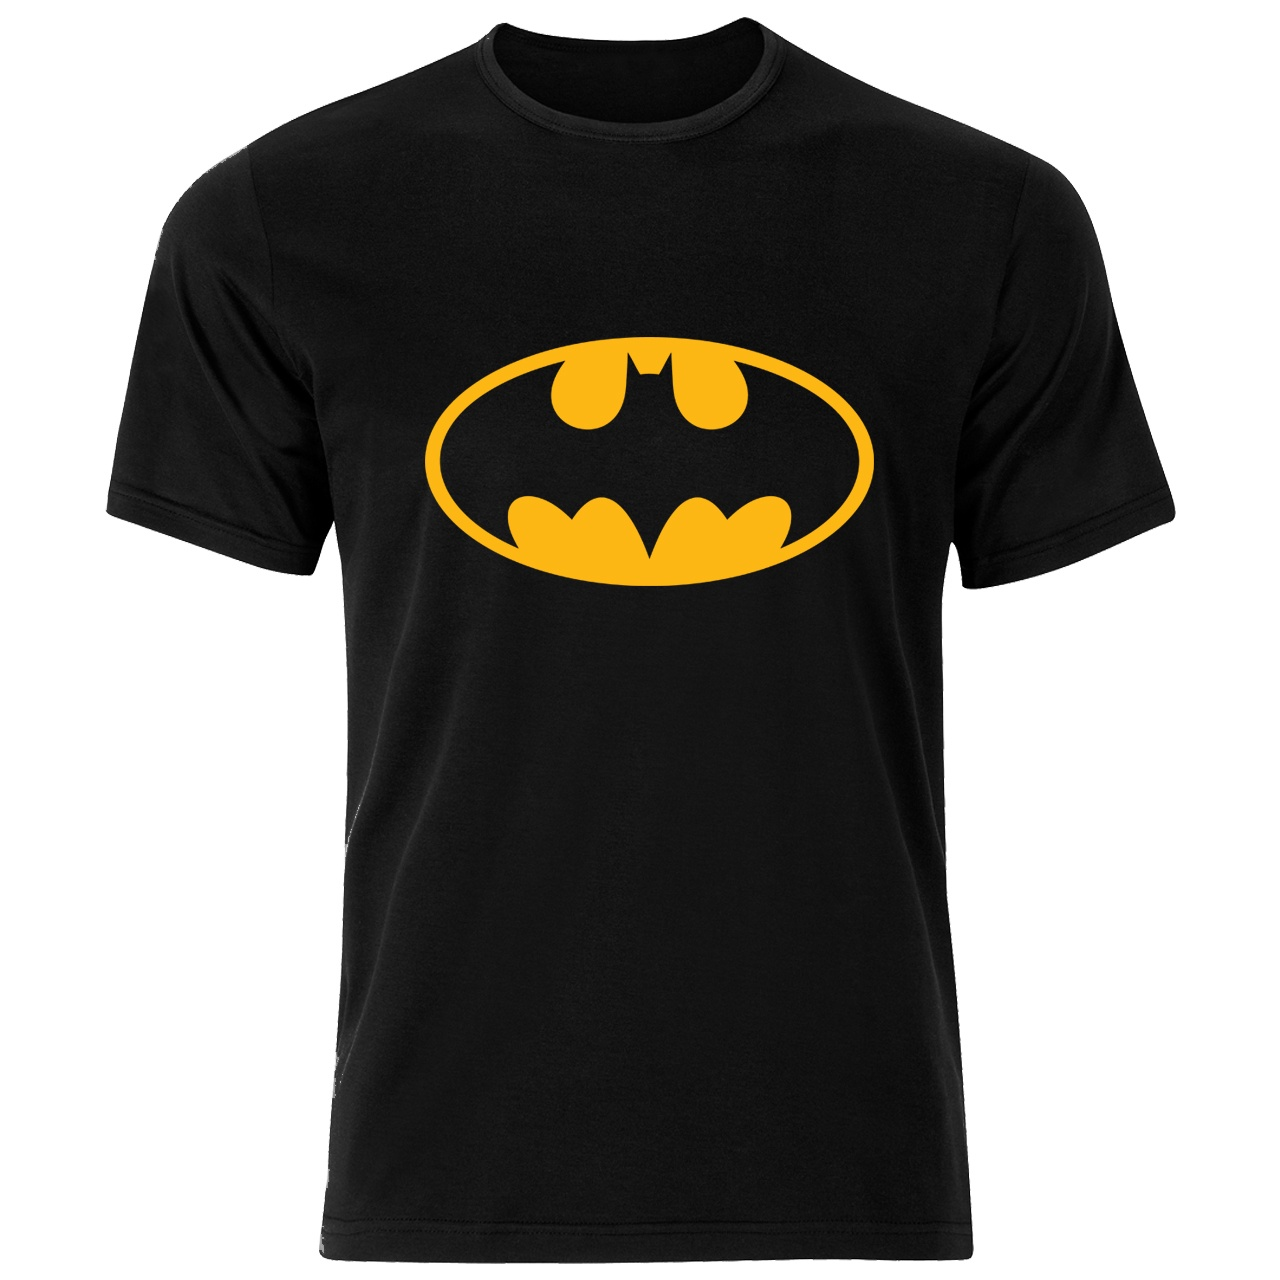 خرید                     تی شرت مردانه نخی فلوریزا طرح بتمن کد batman001M تیشرت